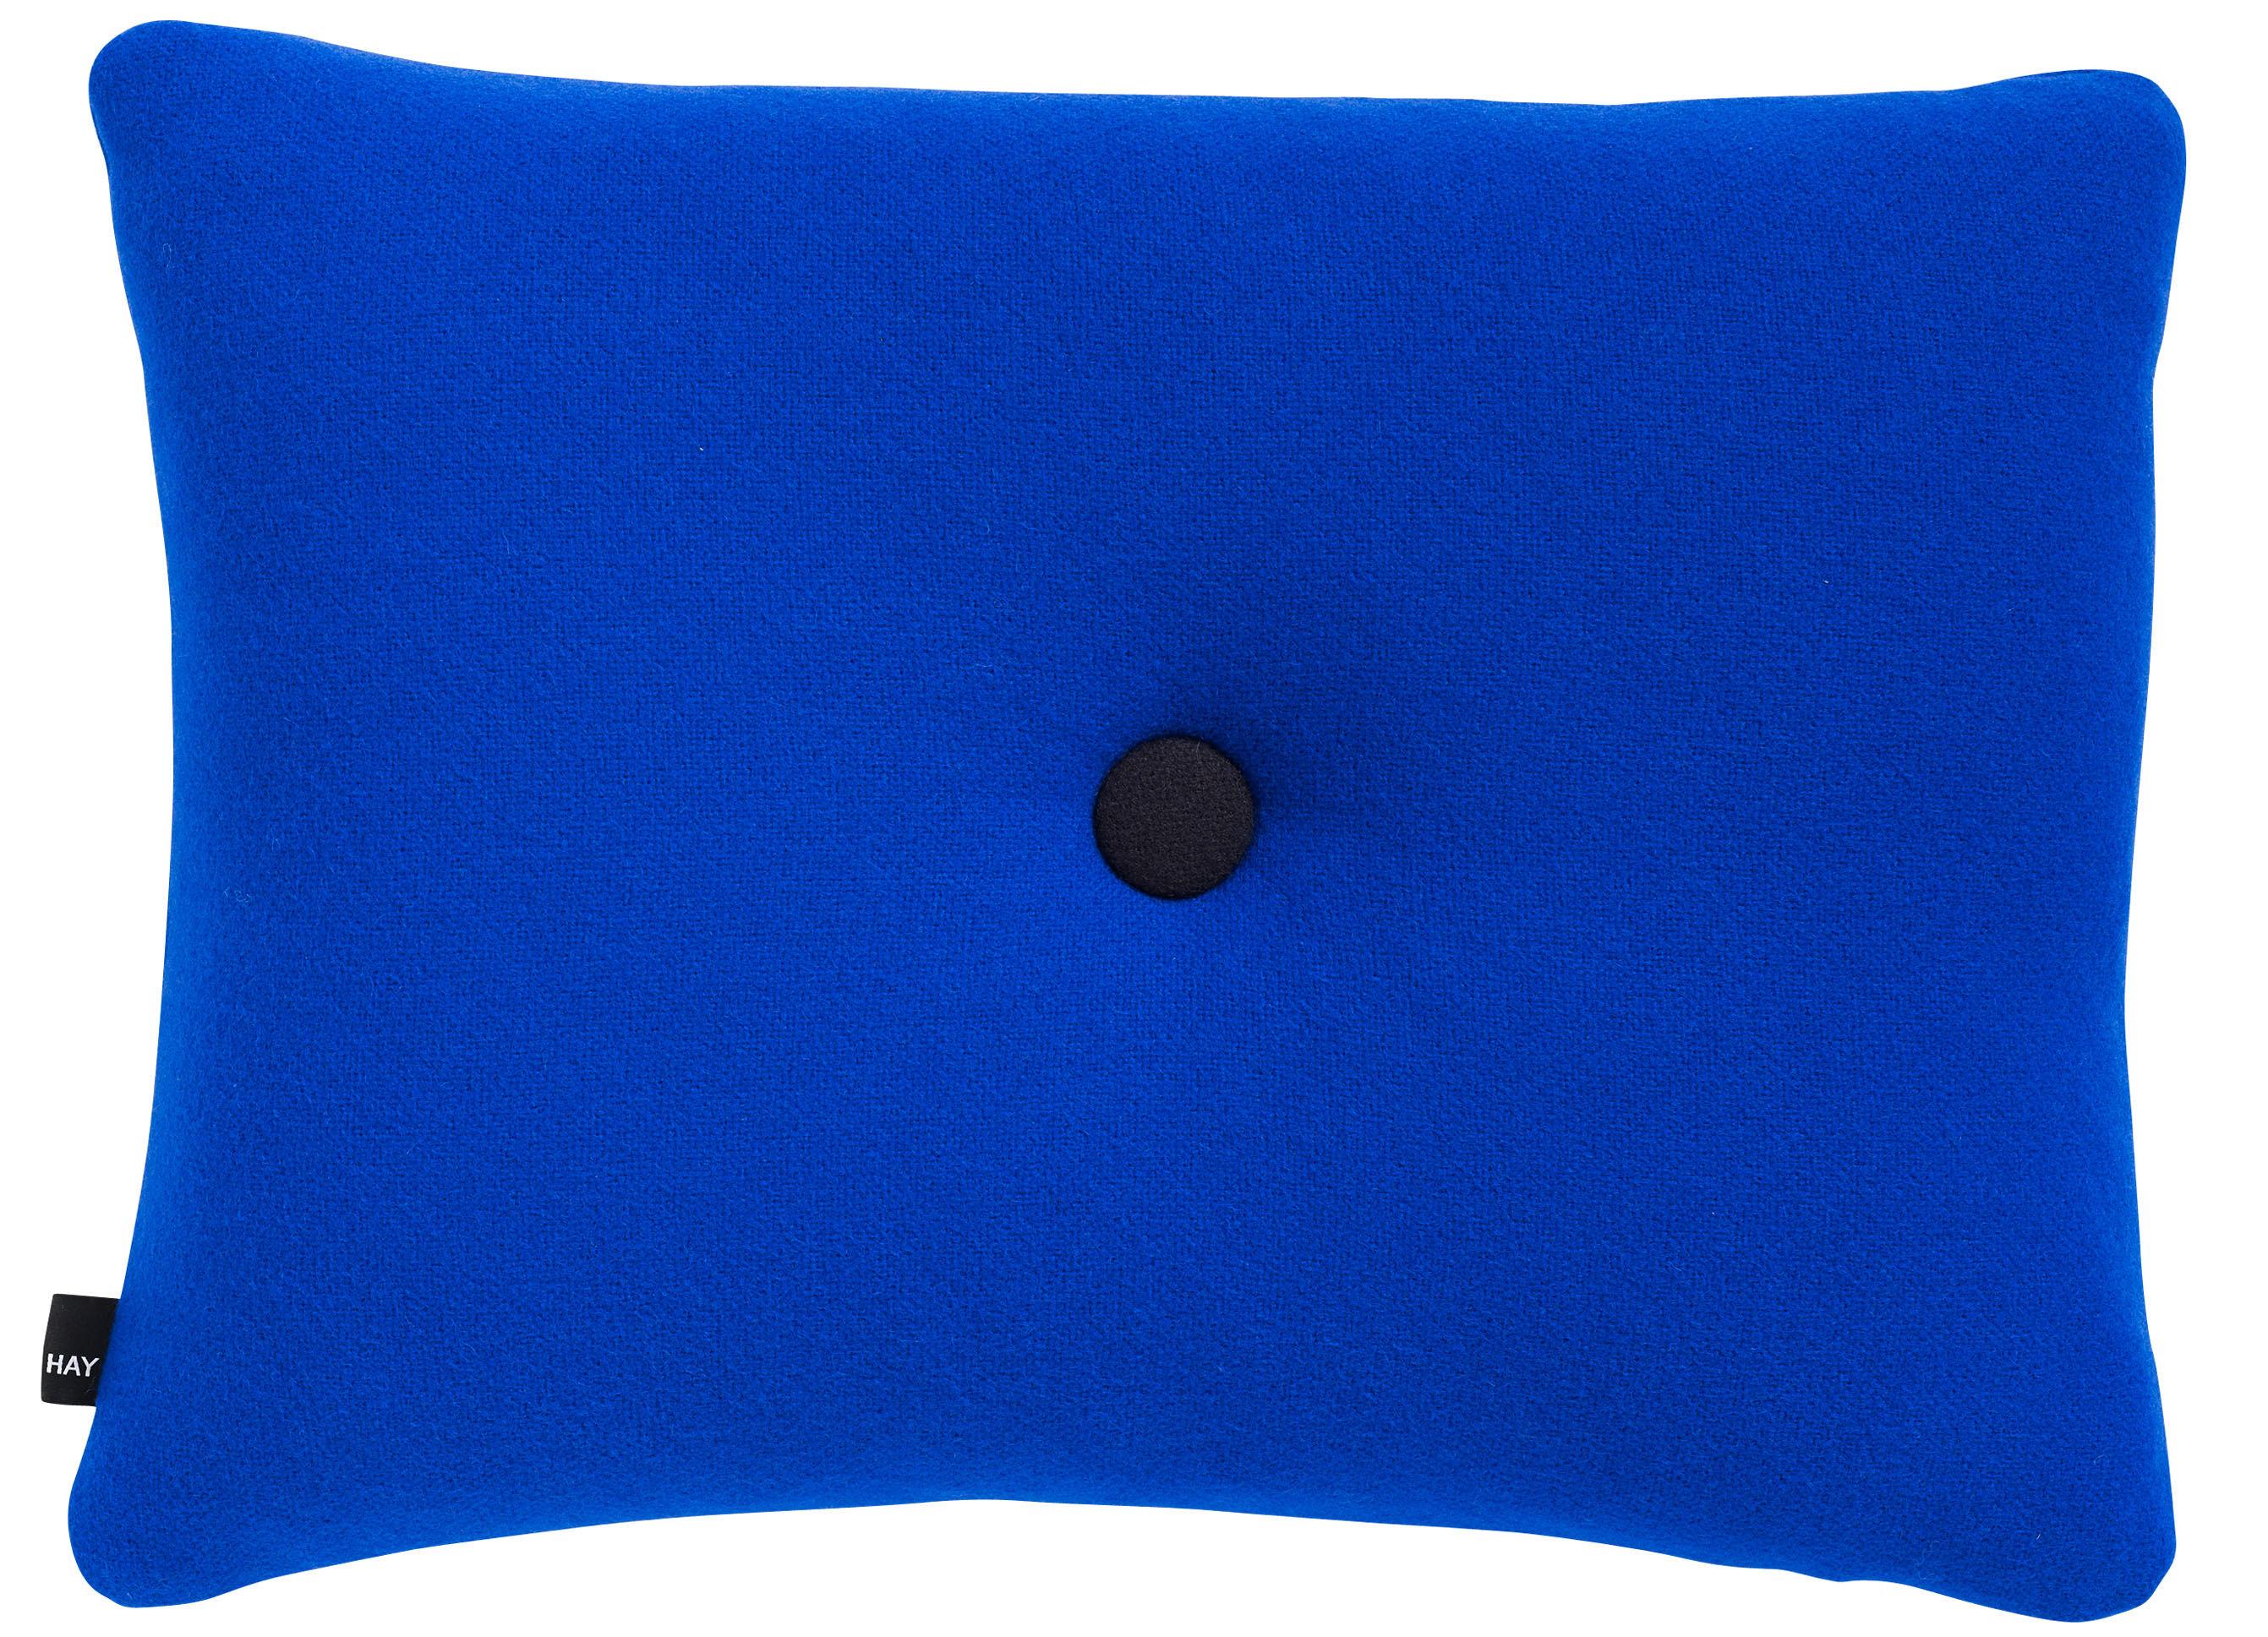 Interni - Cuscini  - Cuscino Dot - Tonus 60 x 45 cm - Hay - Blu elettrico - Tessuto